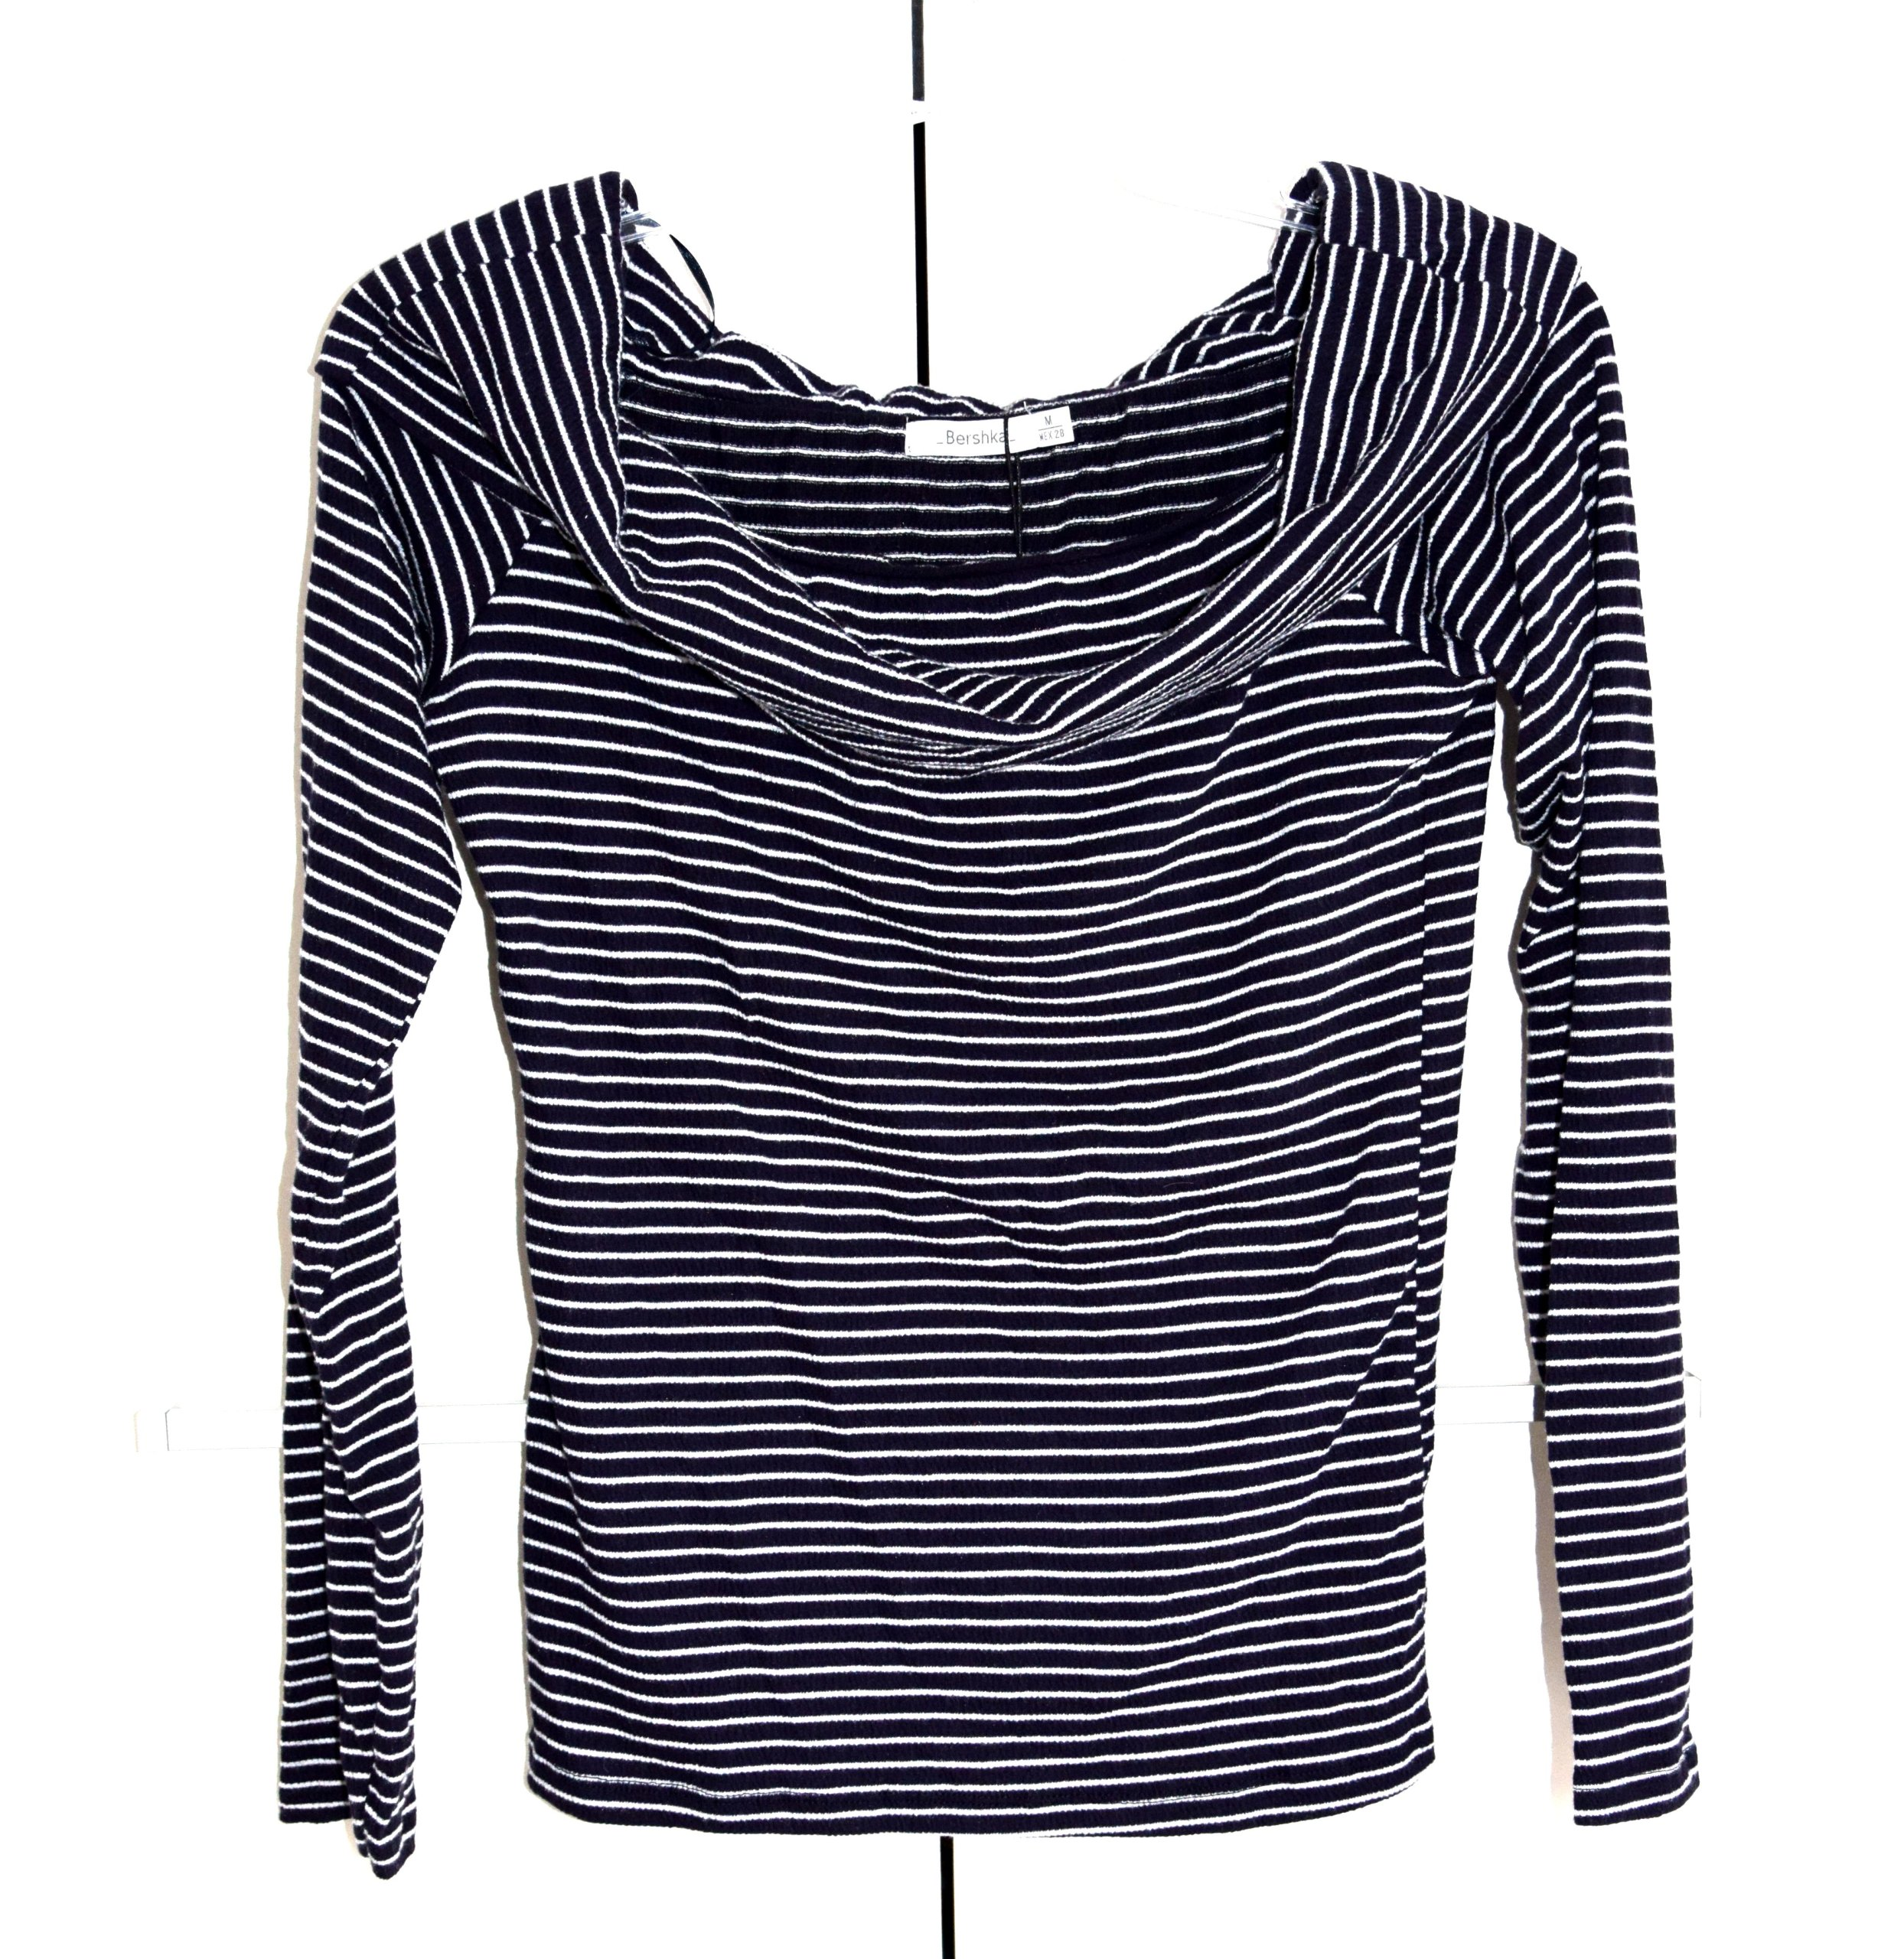 BERSHKA__modny DOPASOWANY GOLF sweter__ 38 M